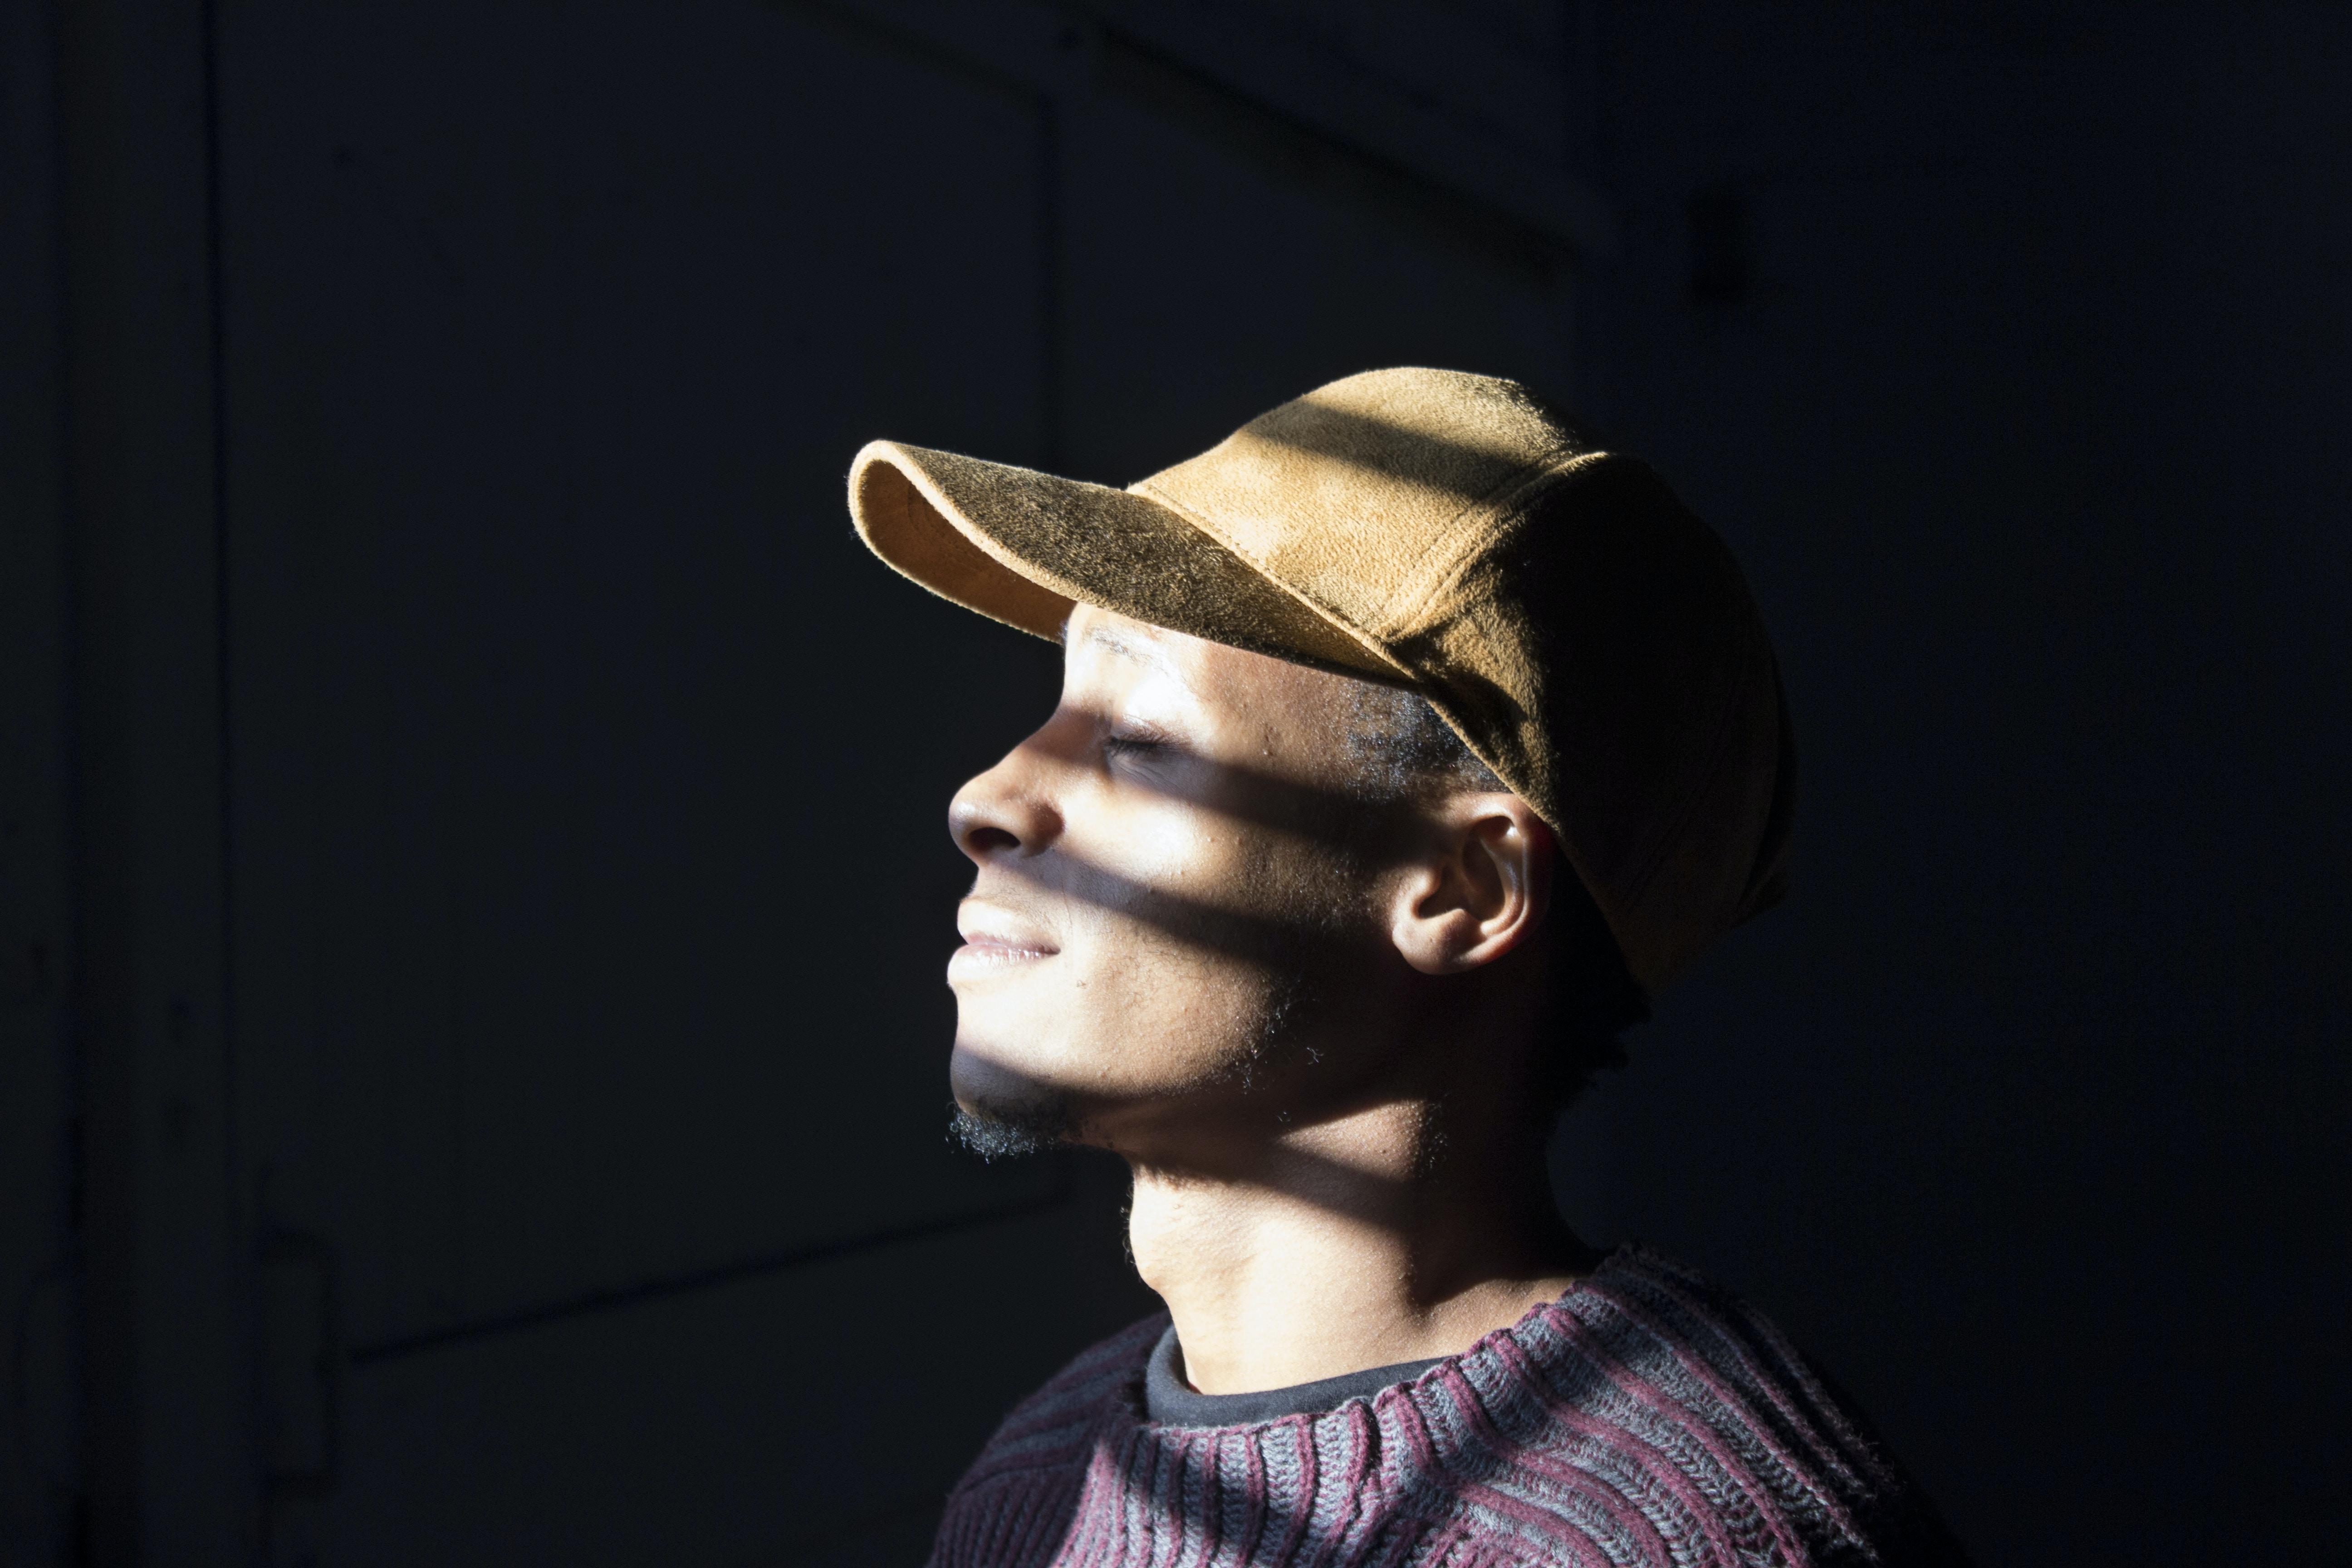 man standing wearing brown cap standing